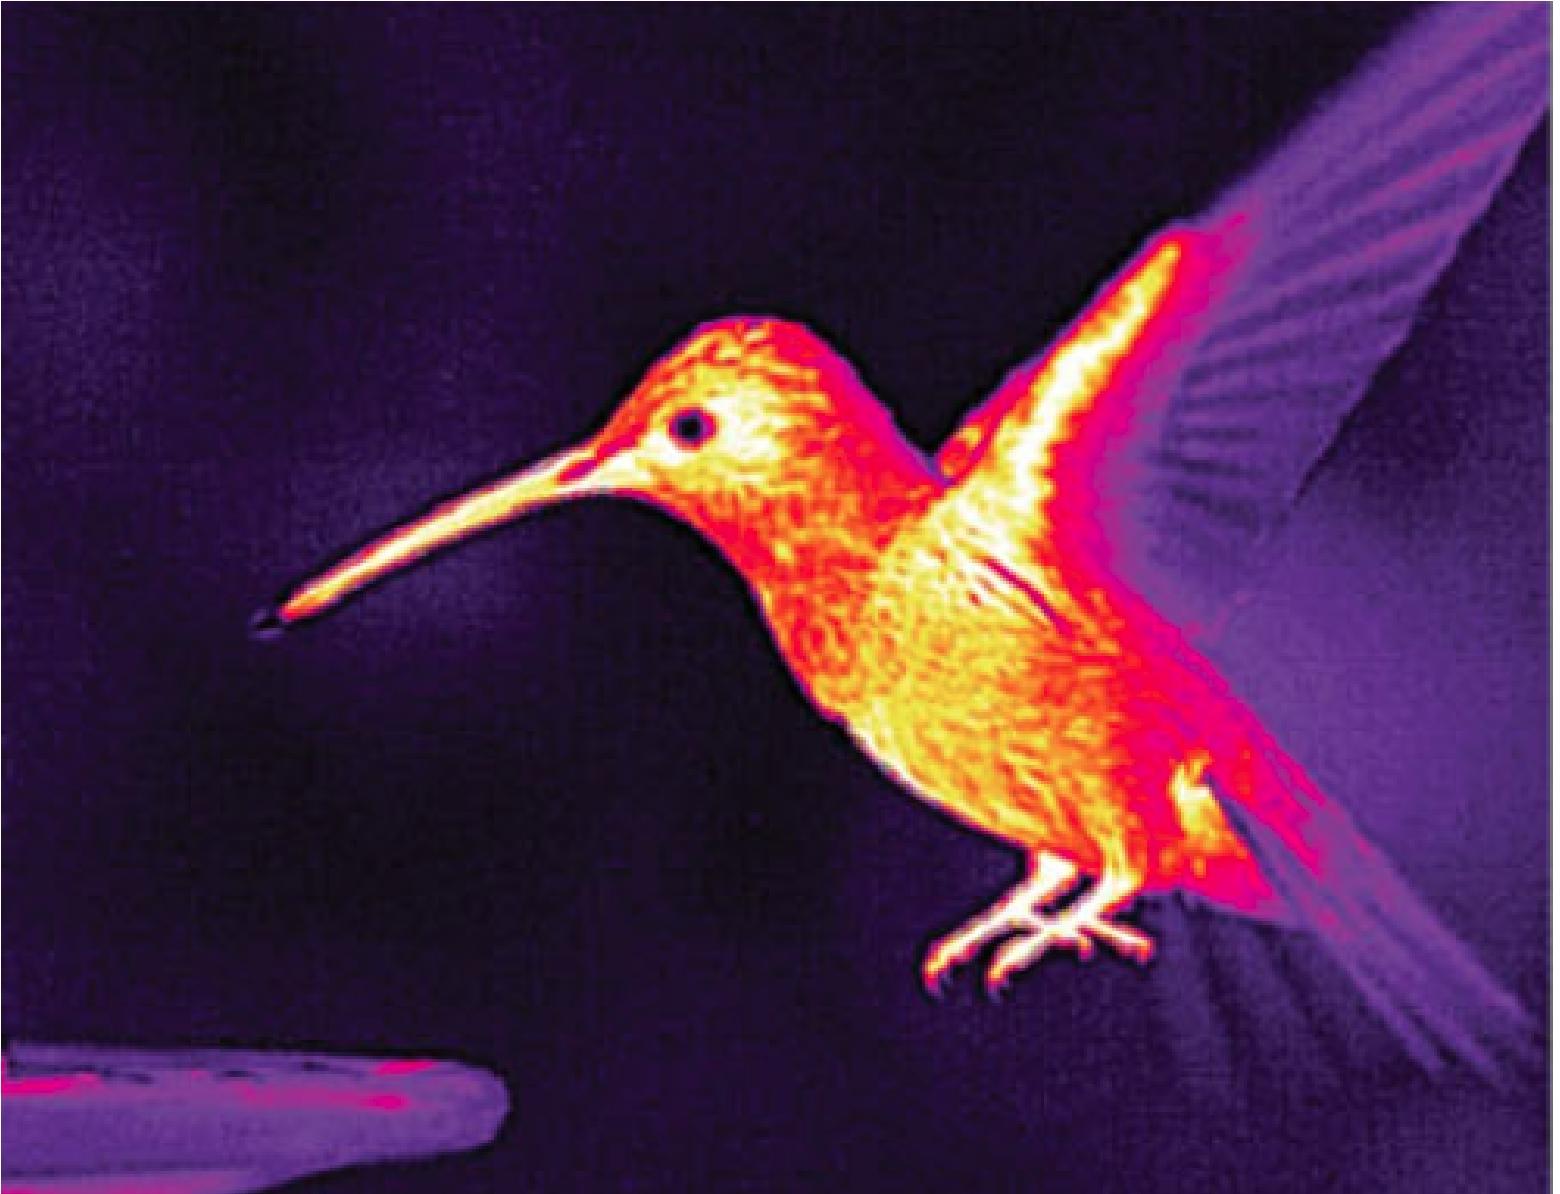 Hummingbird_Heat_Outdoors.jpg